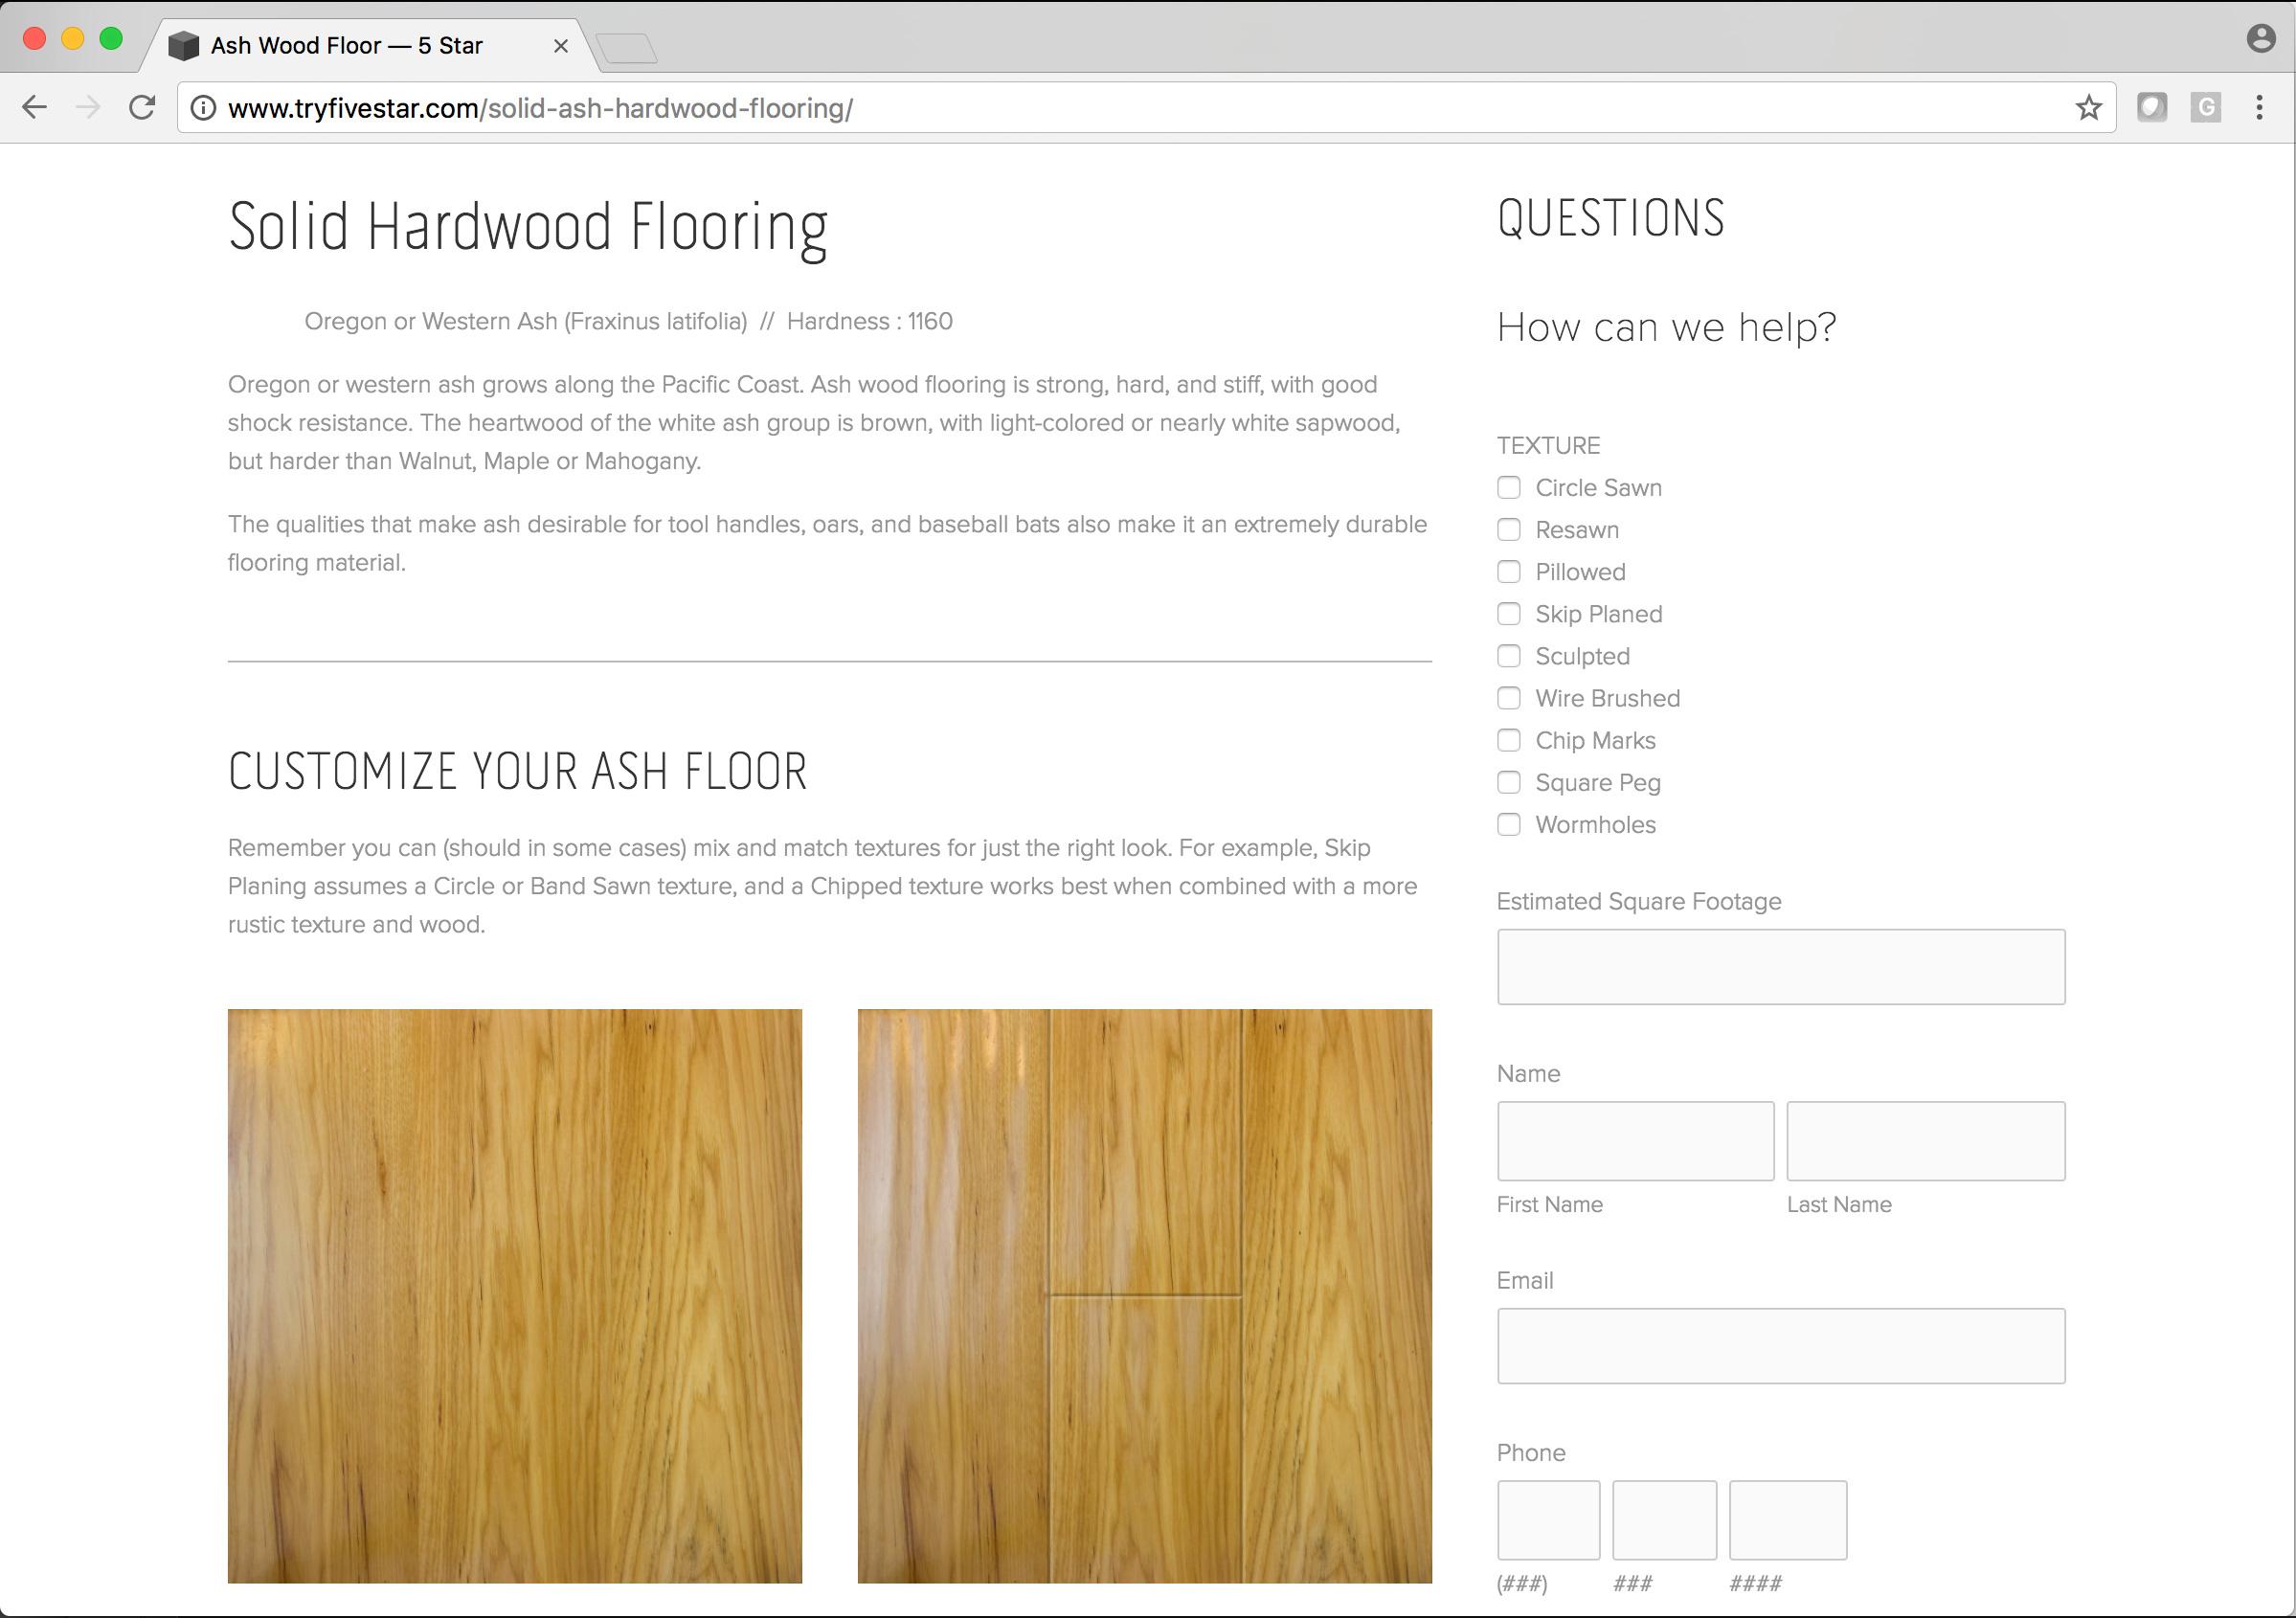 web_design_third_page_image.jpg